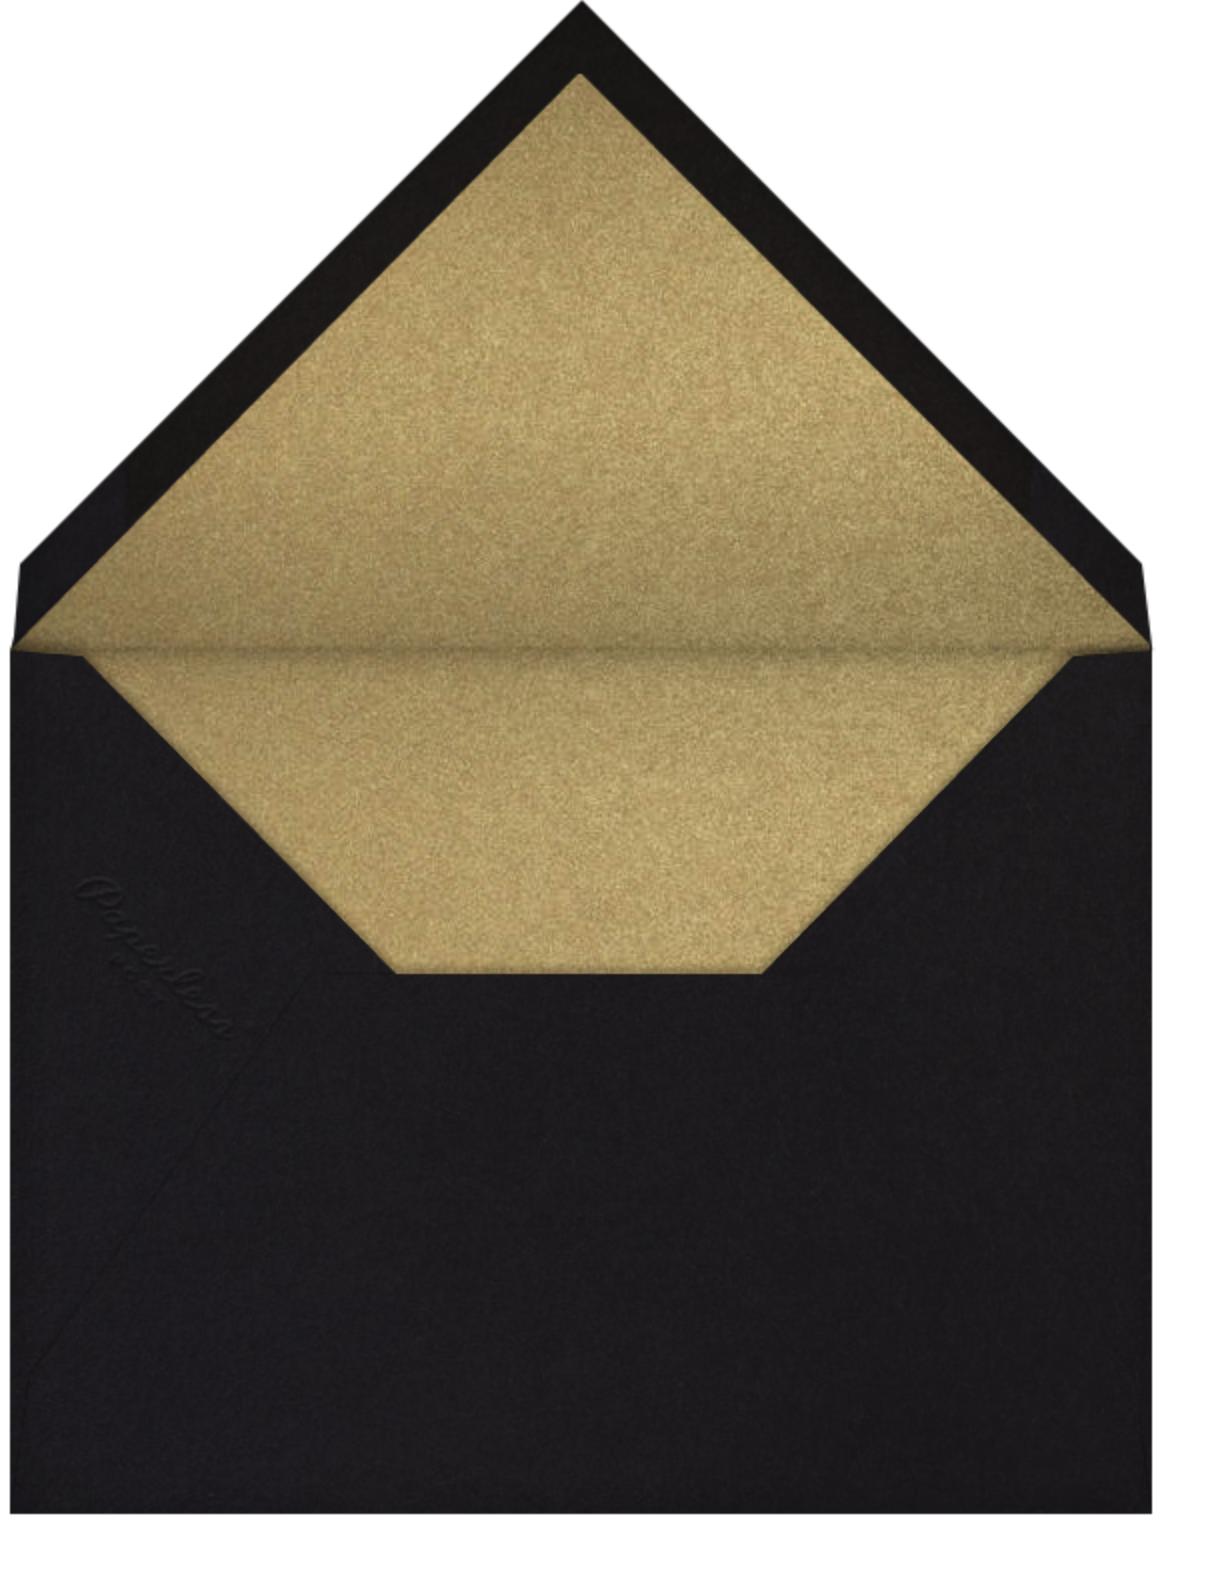 Vegas Bachelor Party - Black - Paperless Post - Envelope